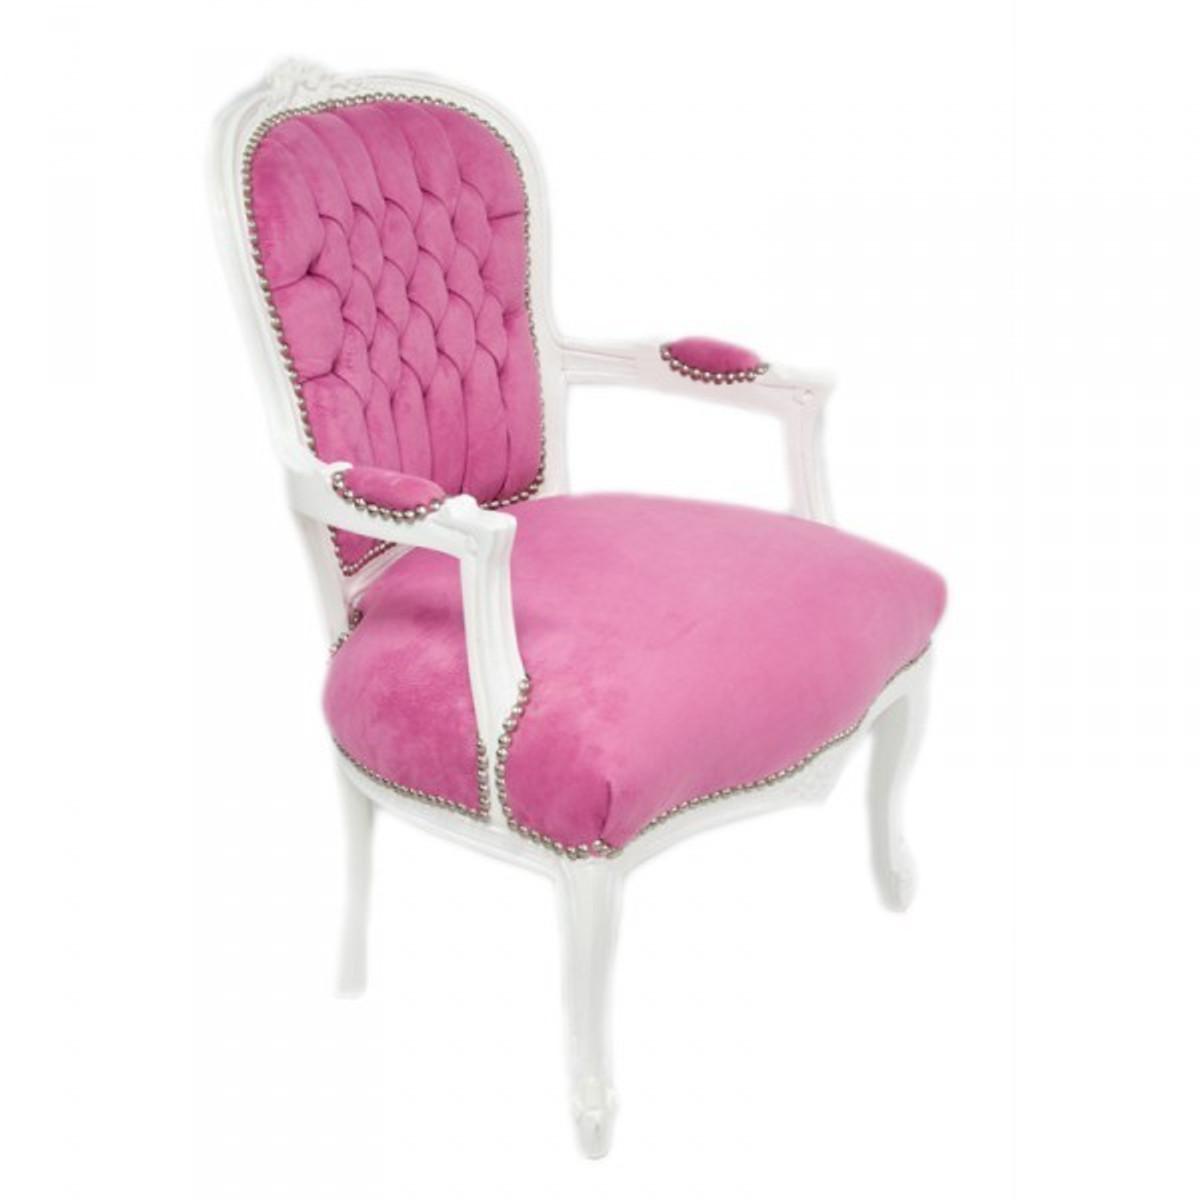 casa padrino barock salon stuhl mod1 rosa weiss st hle barock st hle salon st hle mod1. Black Bedroom Furniture Sets. Home Design Ideas